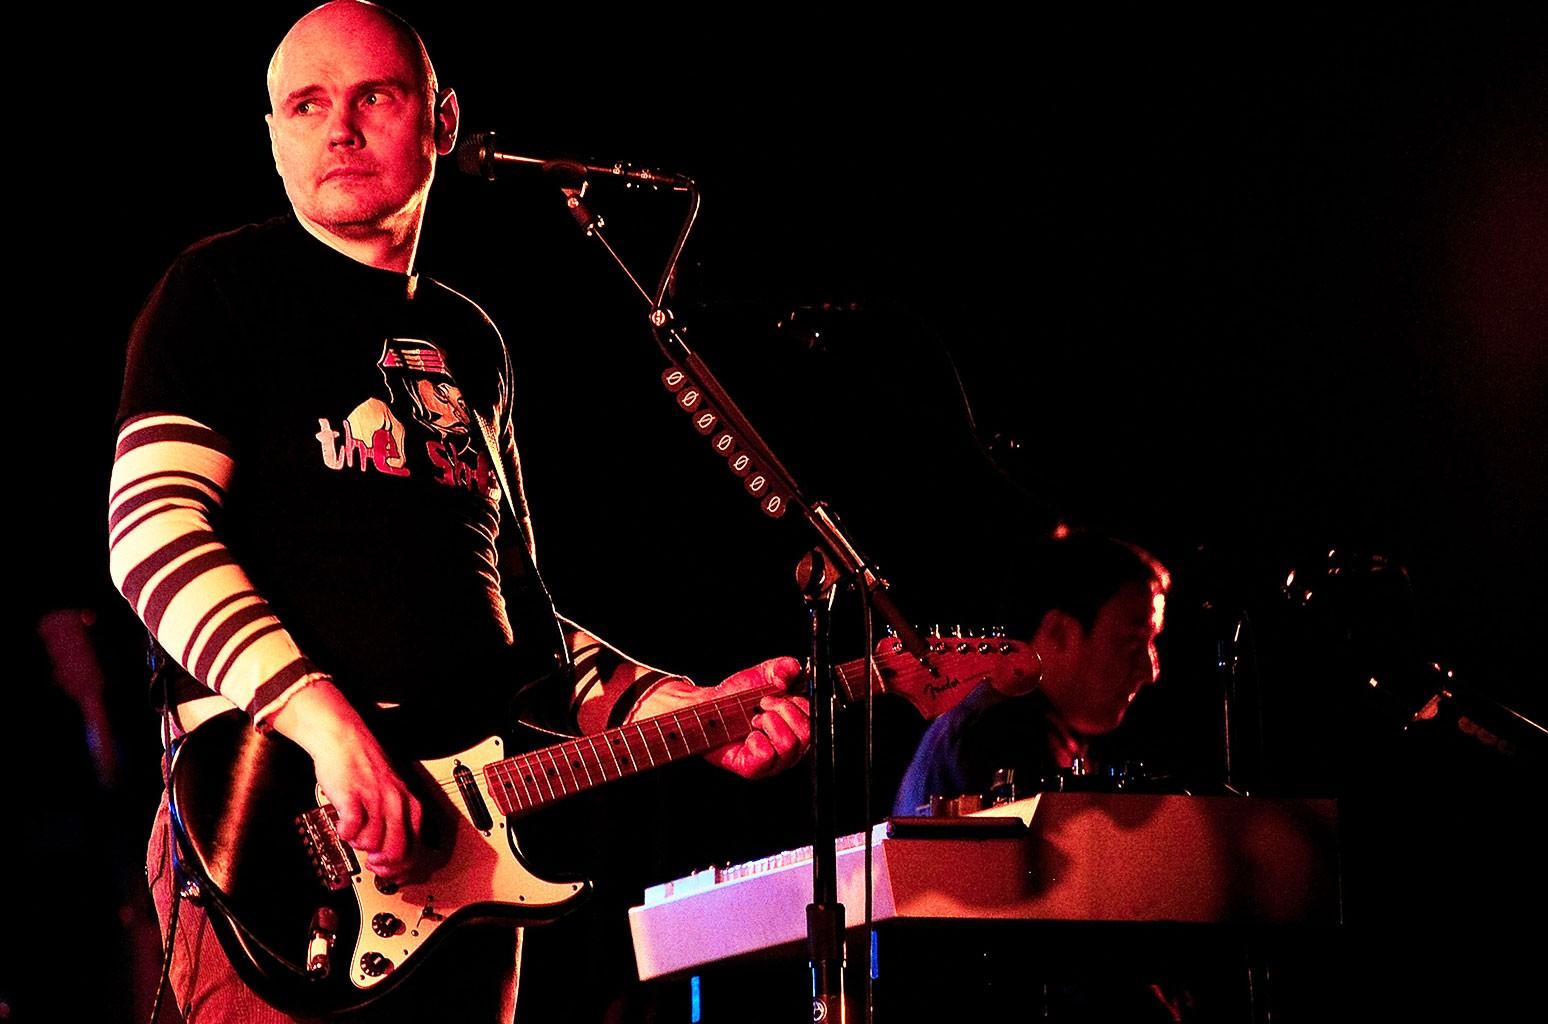 Billy Corgan, The Smashing Pumpkins, Barclays Center, 2012